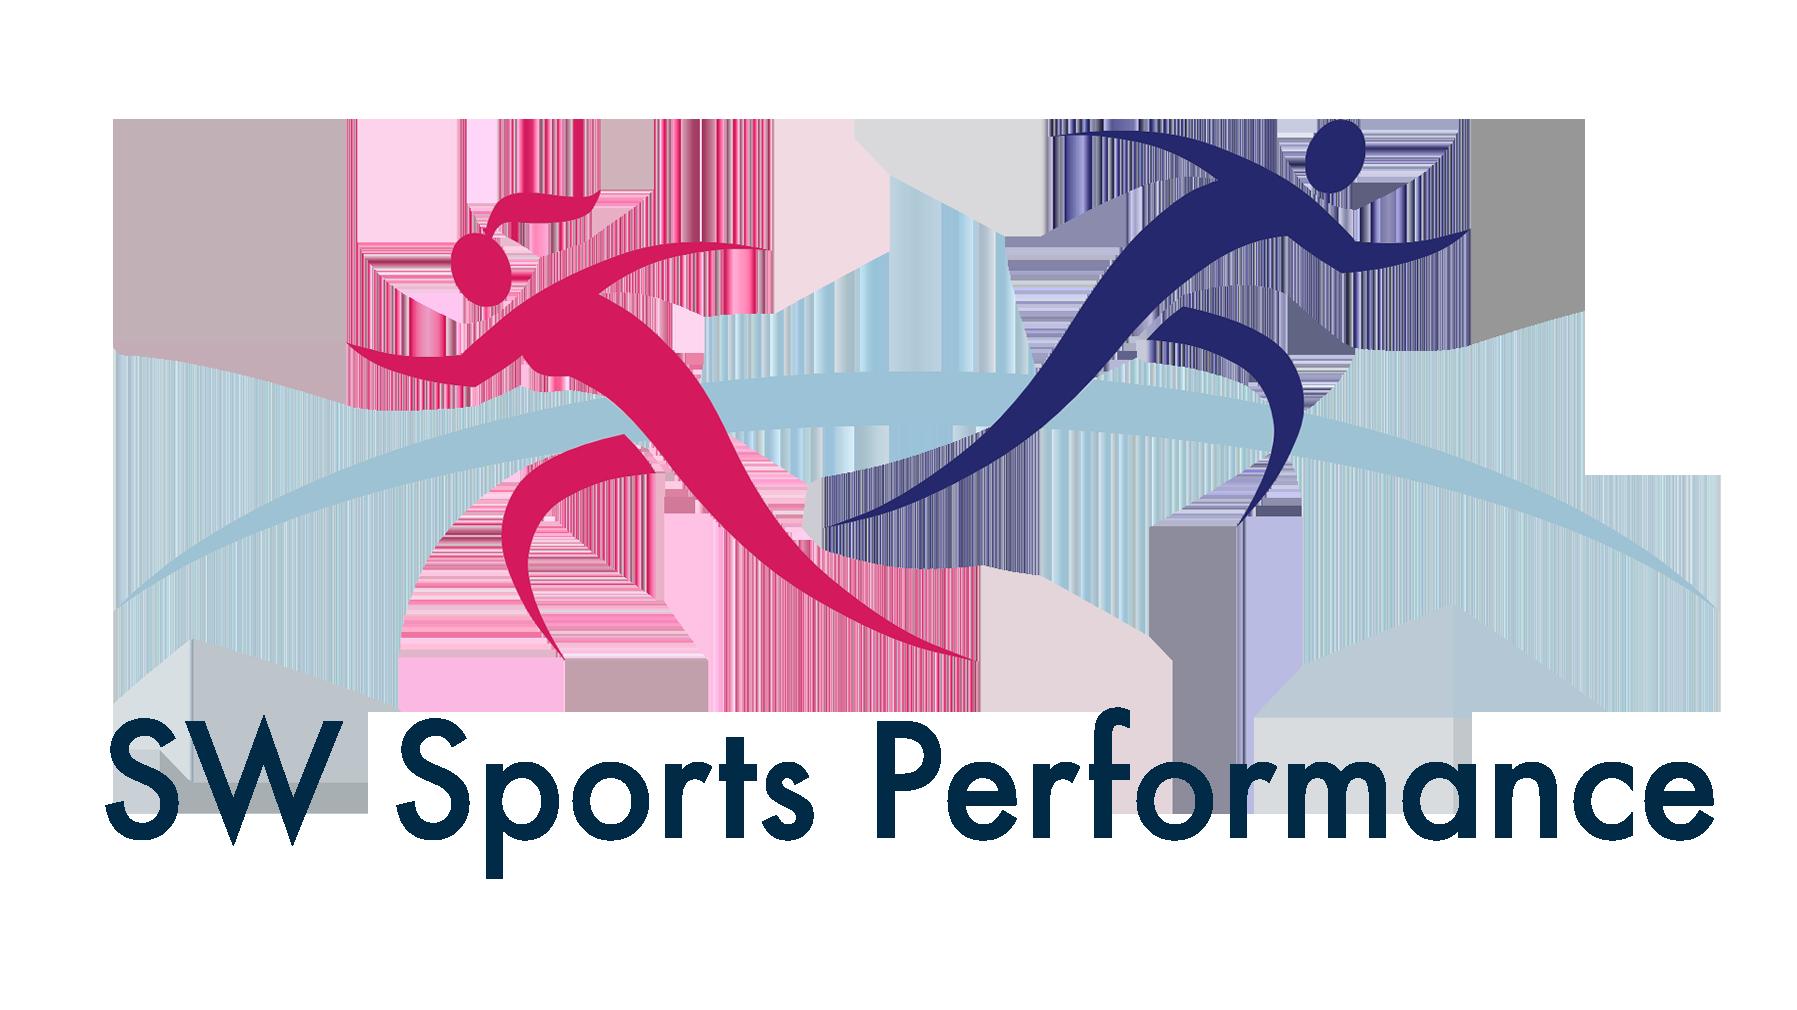 SW Sports Performance